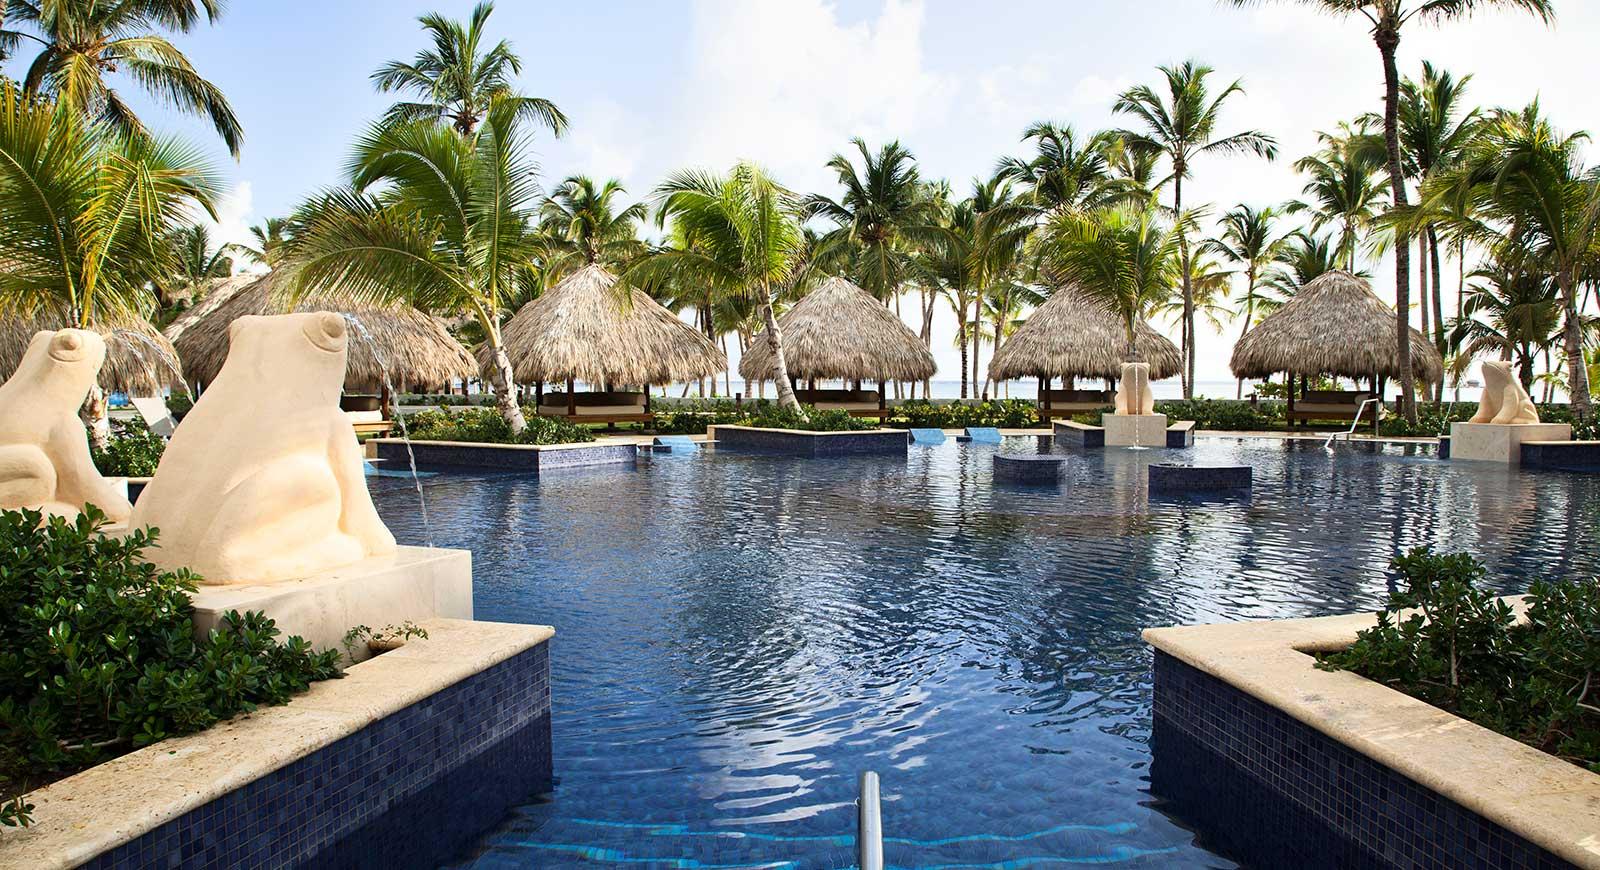 Barceló Bávaro Palace Punta Cana Bavaropalace All Inclusive Resort Bavaro Beach